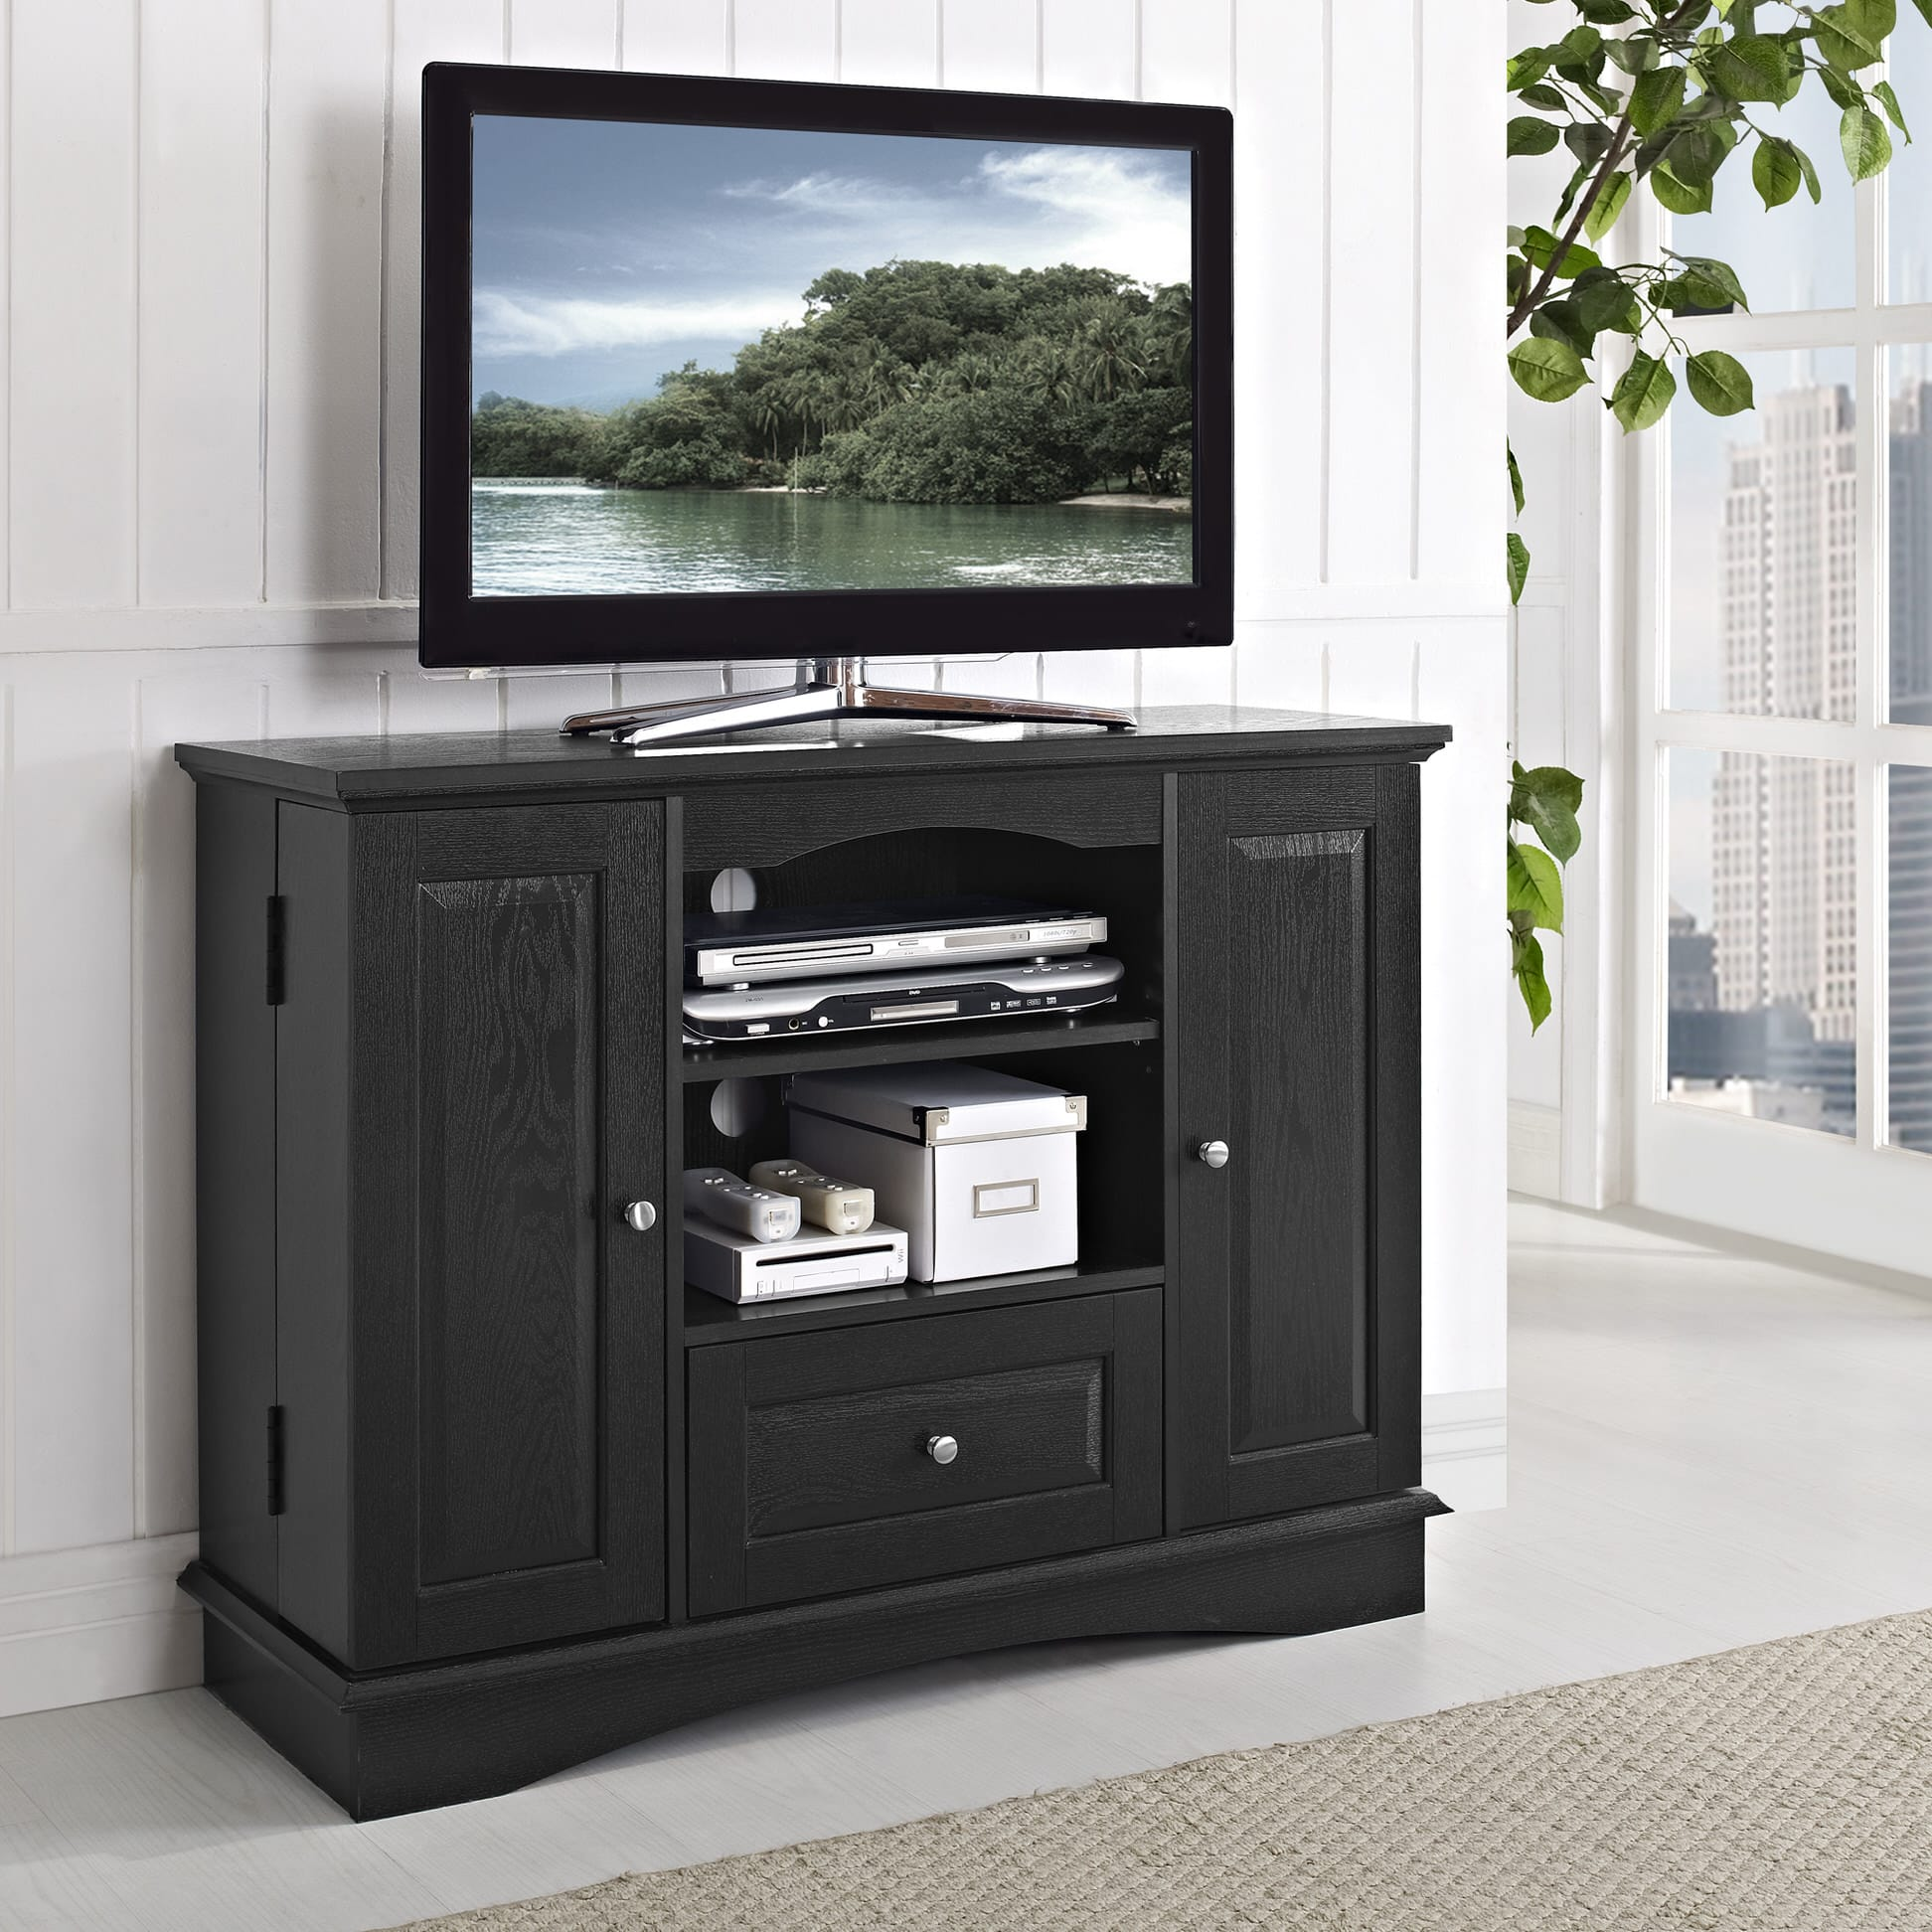 Highboy 42 Inch Tv Stand Black By Walker Edison